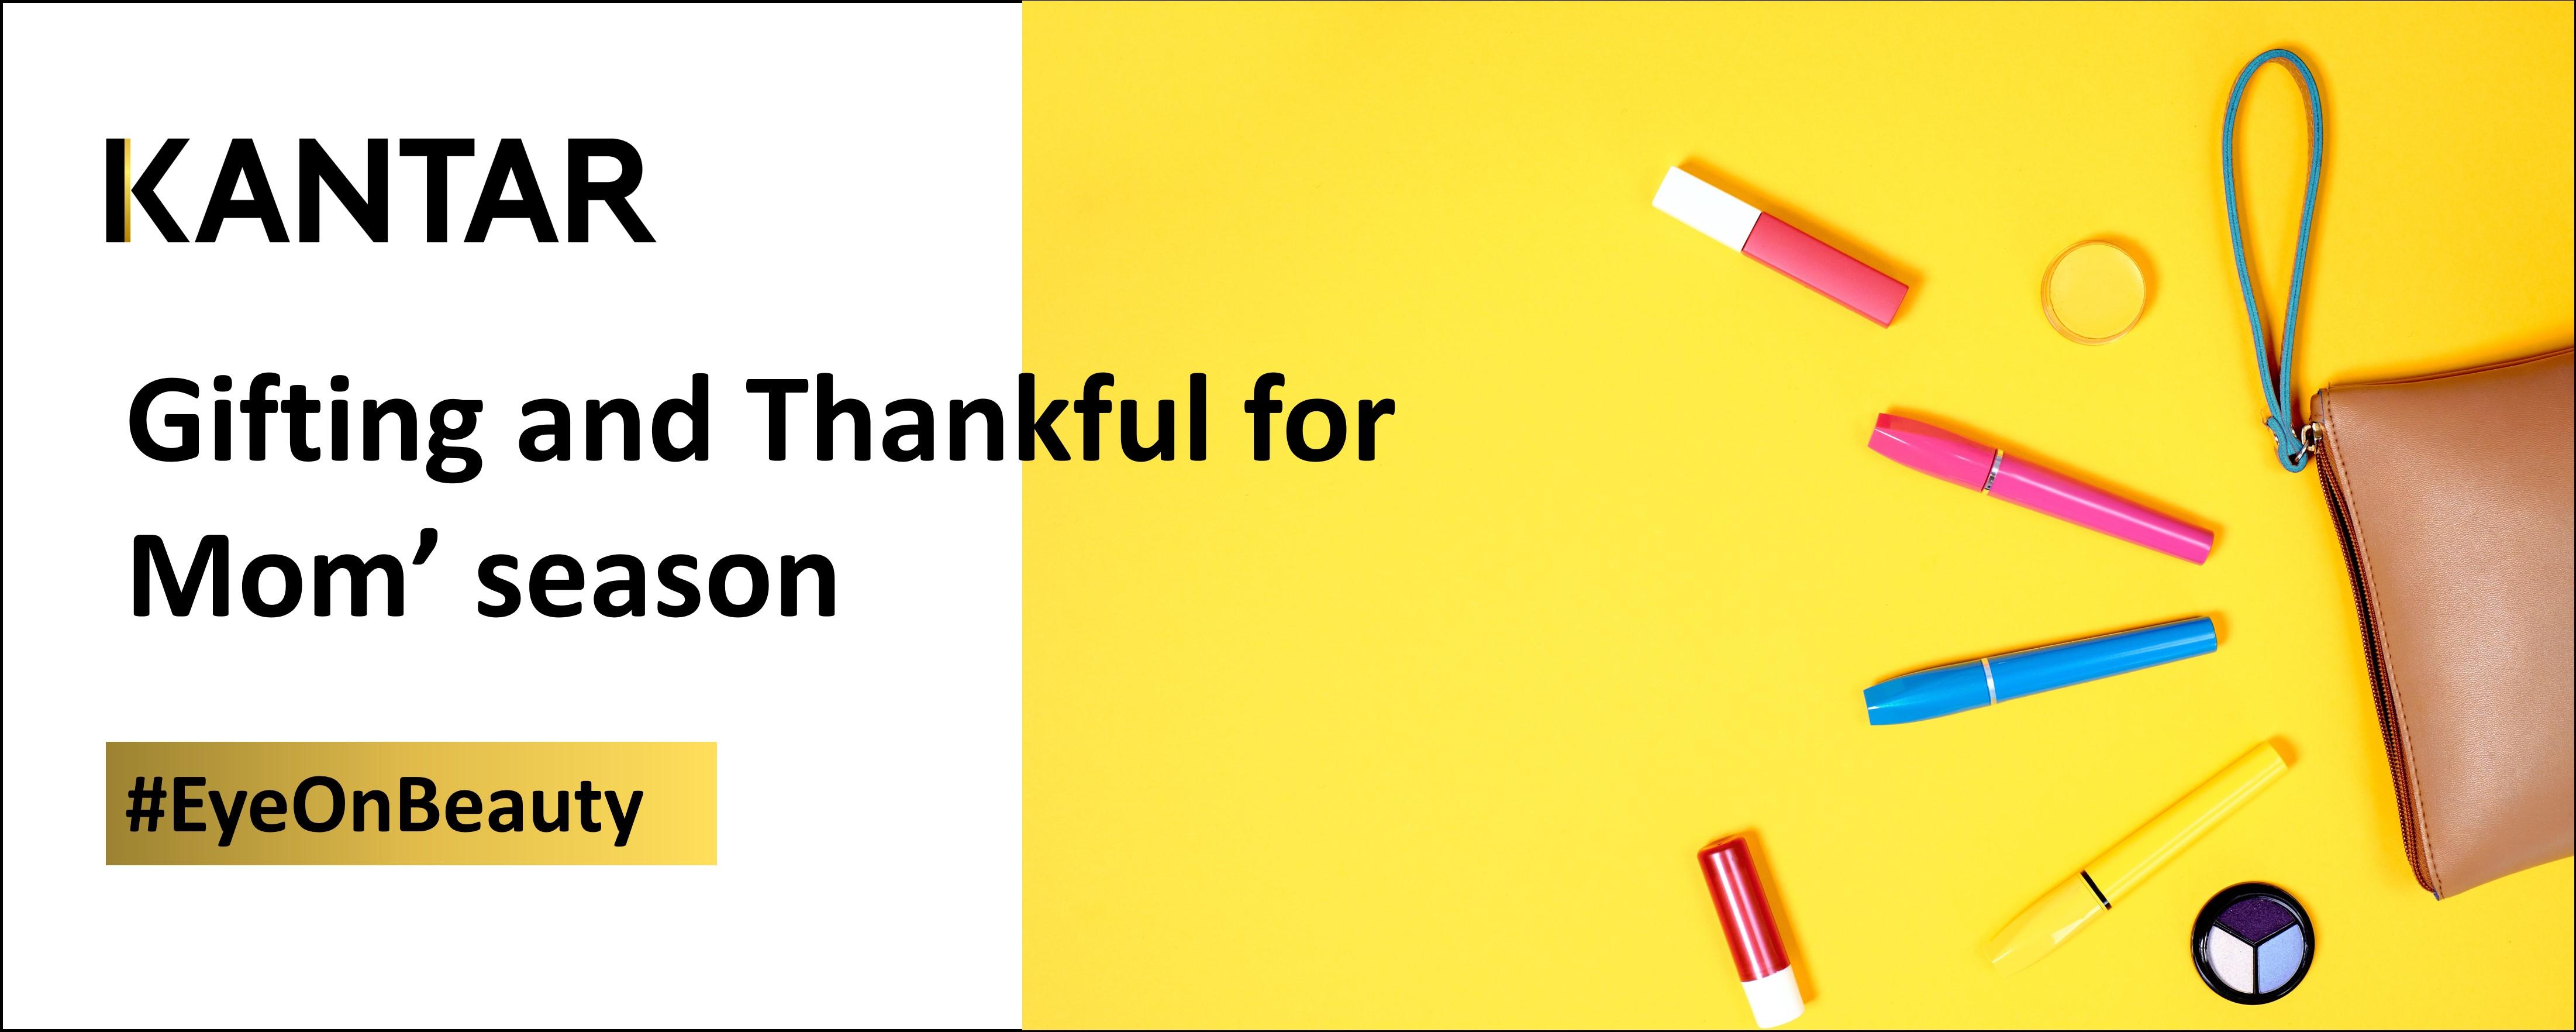 EyeOnBeauty - Gifting and Thankful for Mom' season